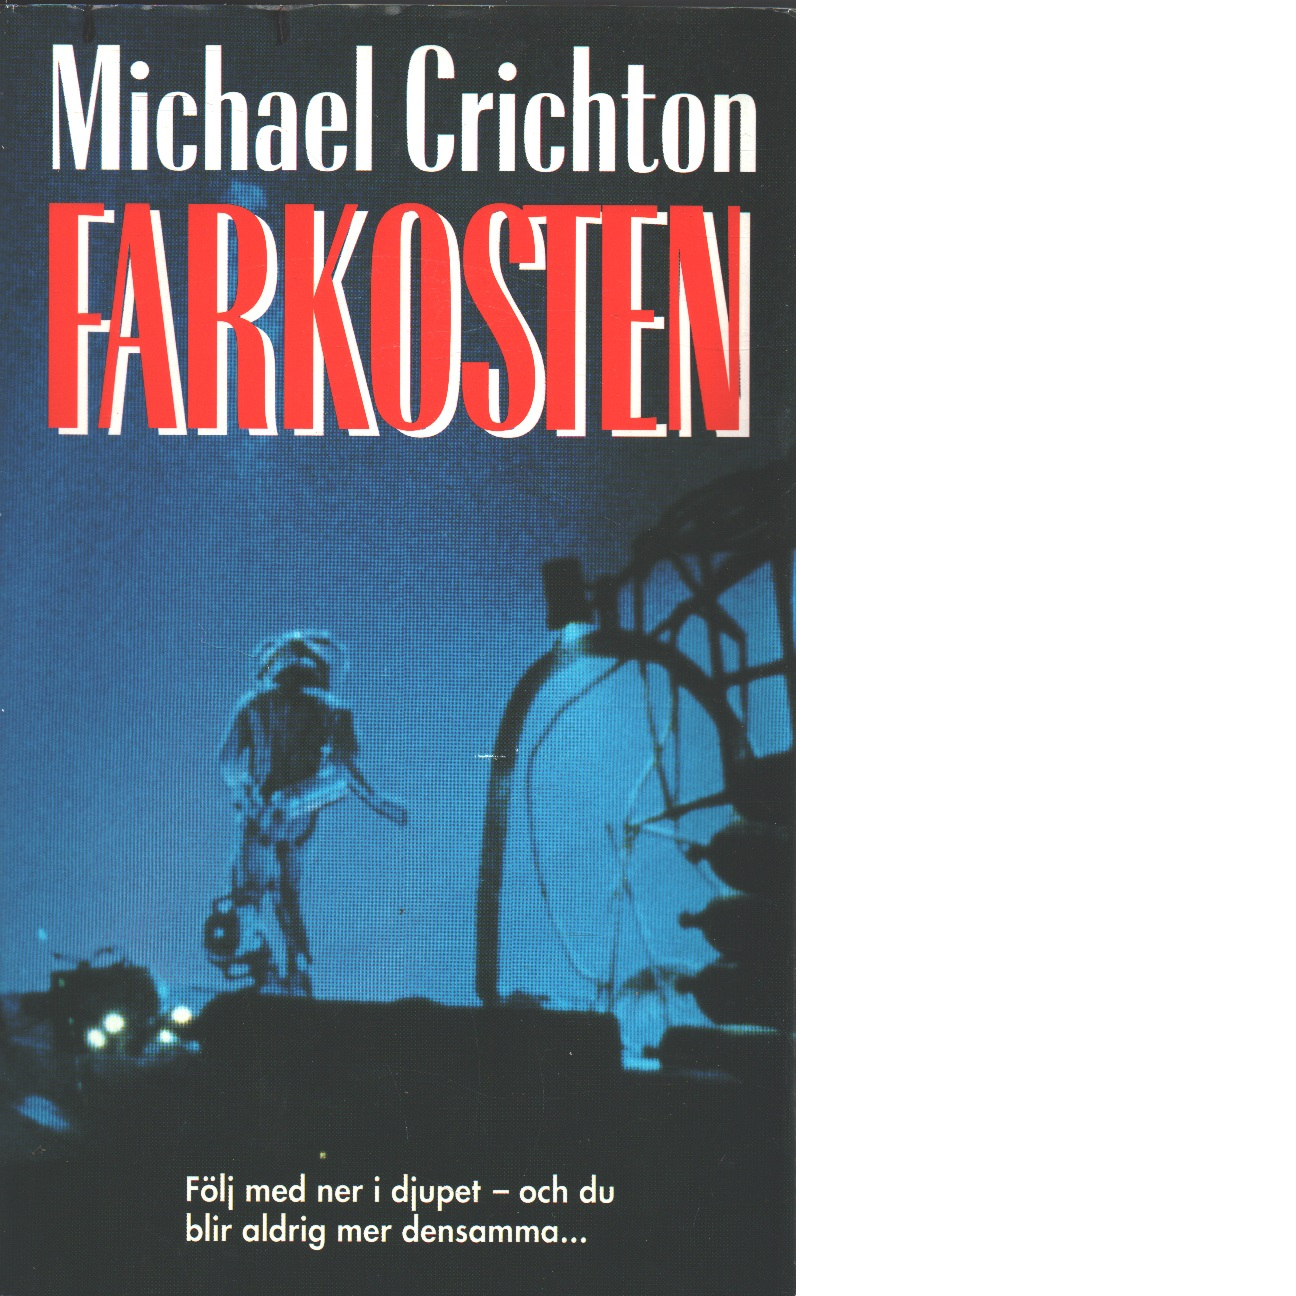 Farkosten - Crichton, Michael